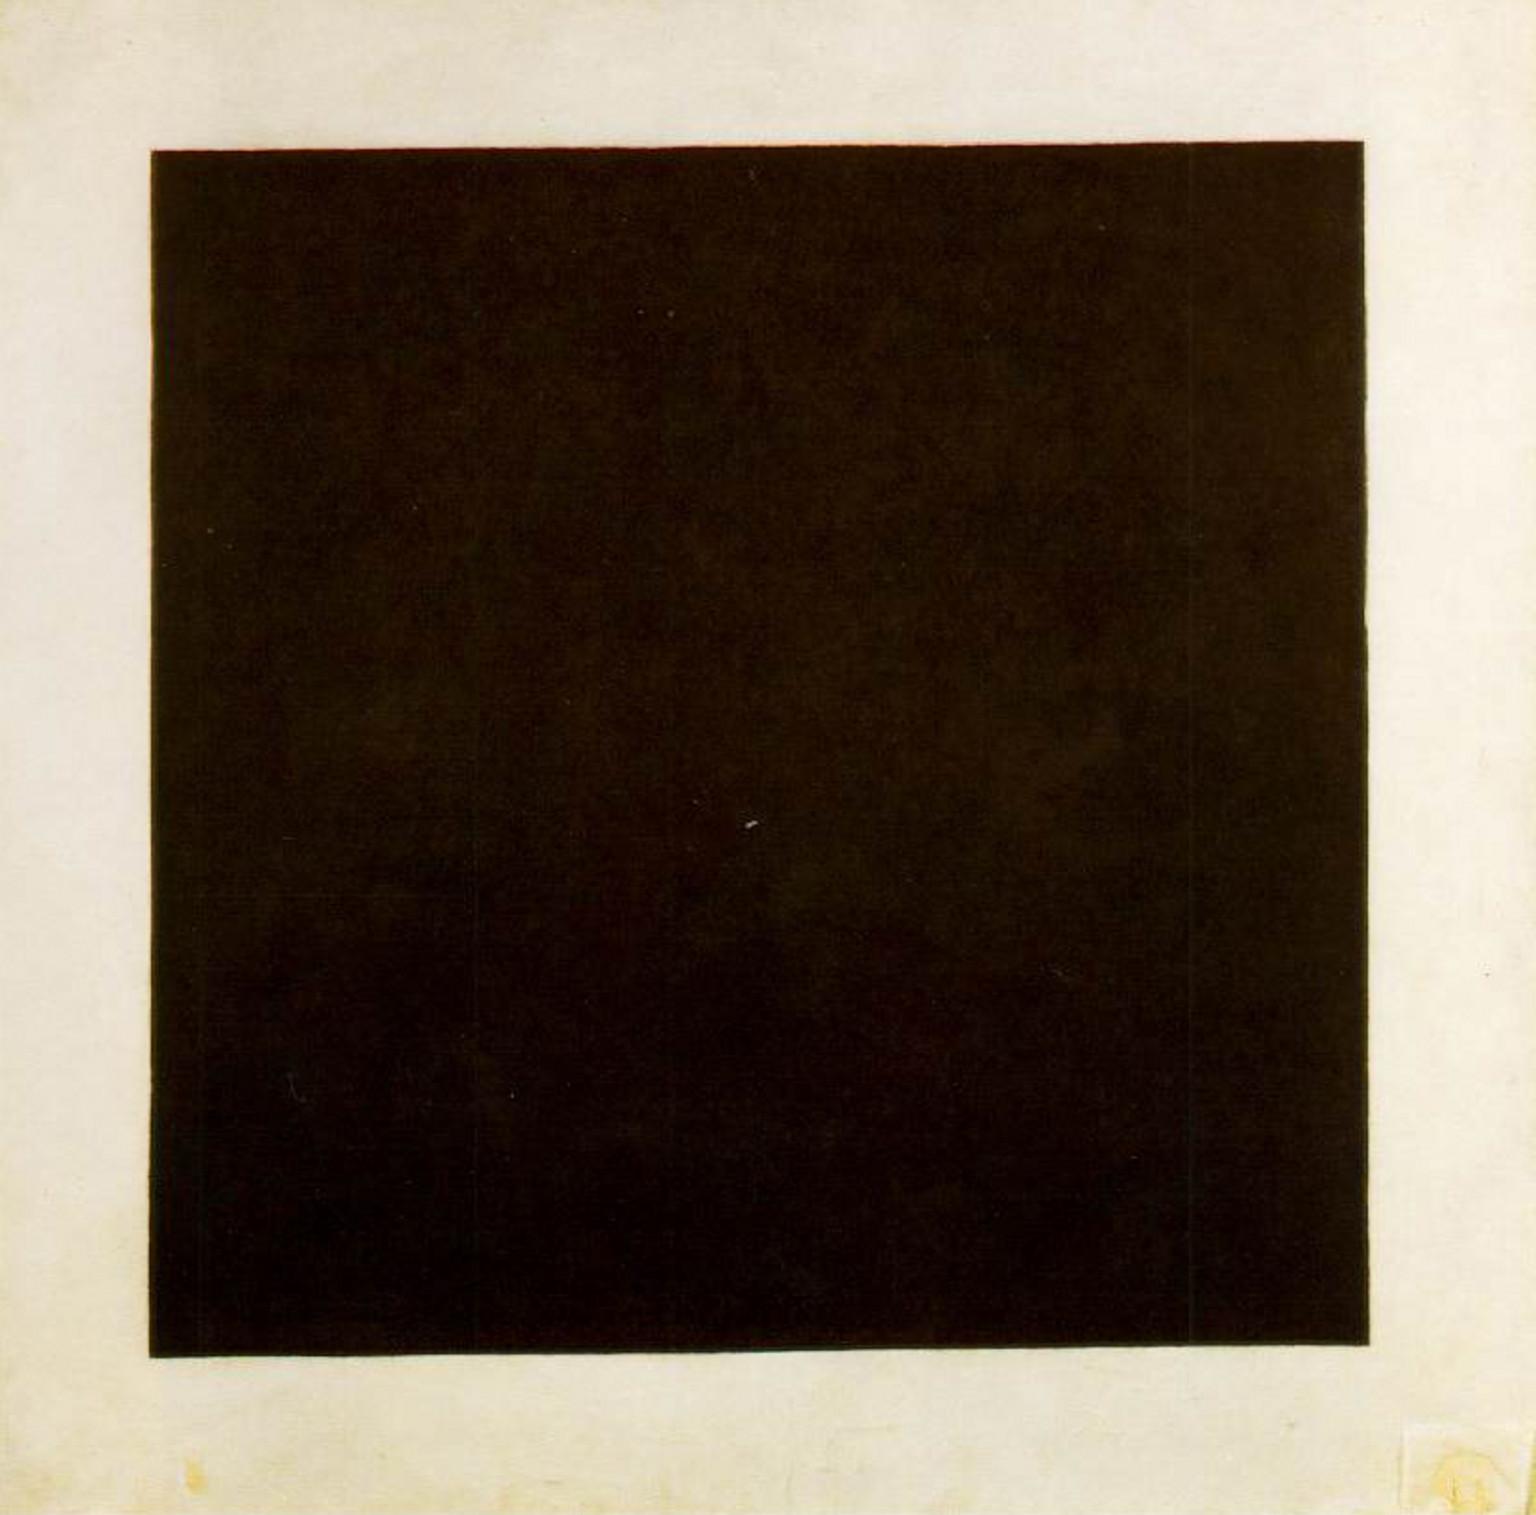 Cuadrado negro sobre fondo blanco. Kasimir Malevich, 1913. Óleo sobre tela (106,2 x 106,5 cm)